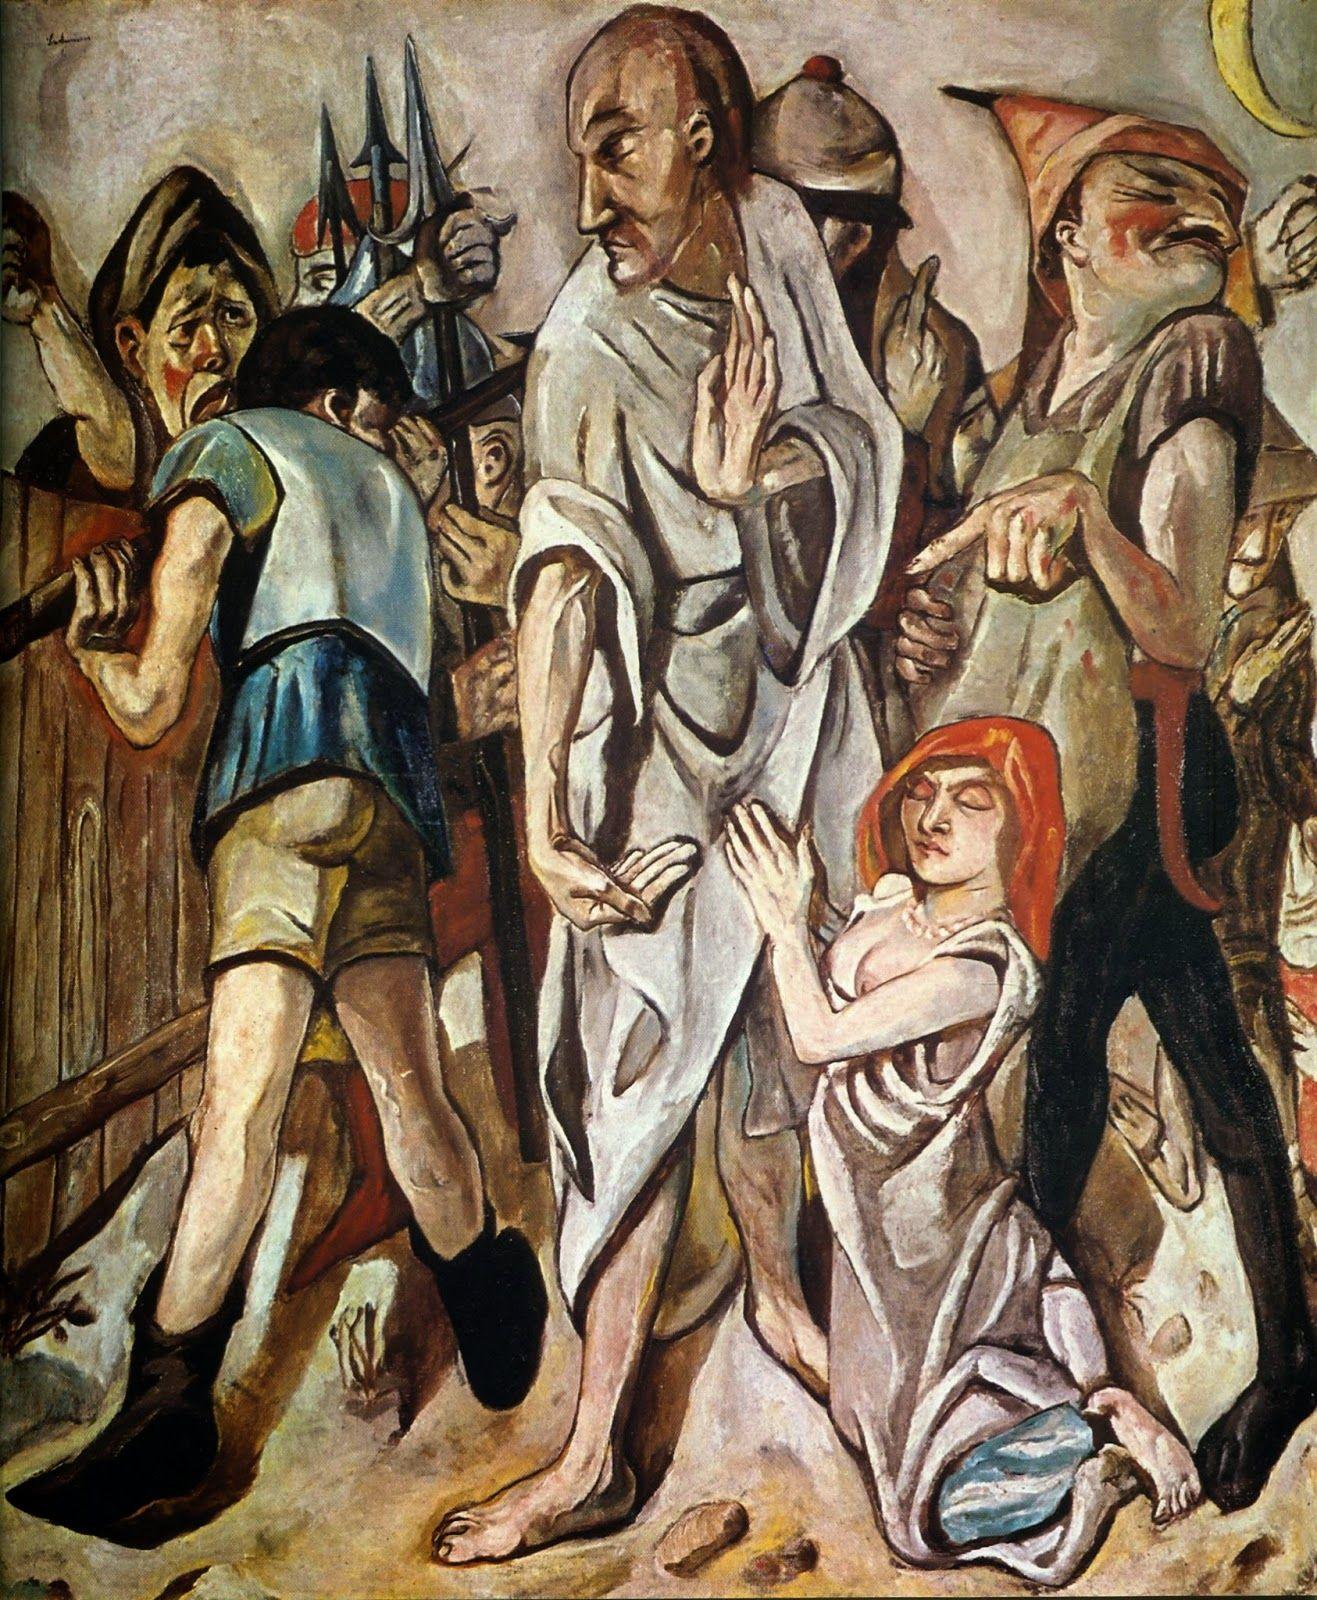 Max beckmann (1884-1950) La mujer adúltera (con imágenes) | Arte ...